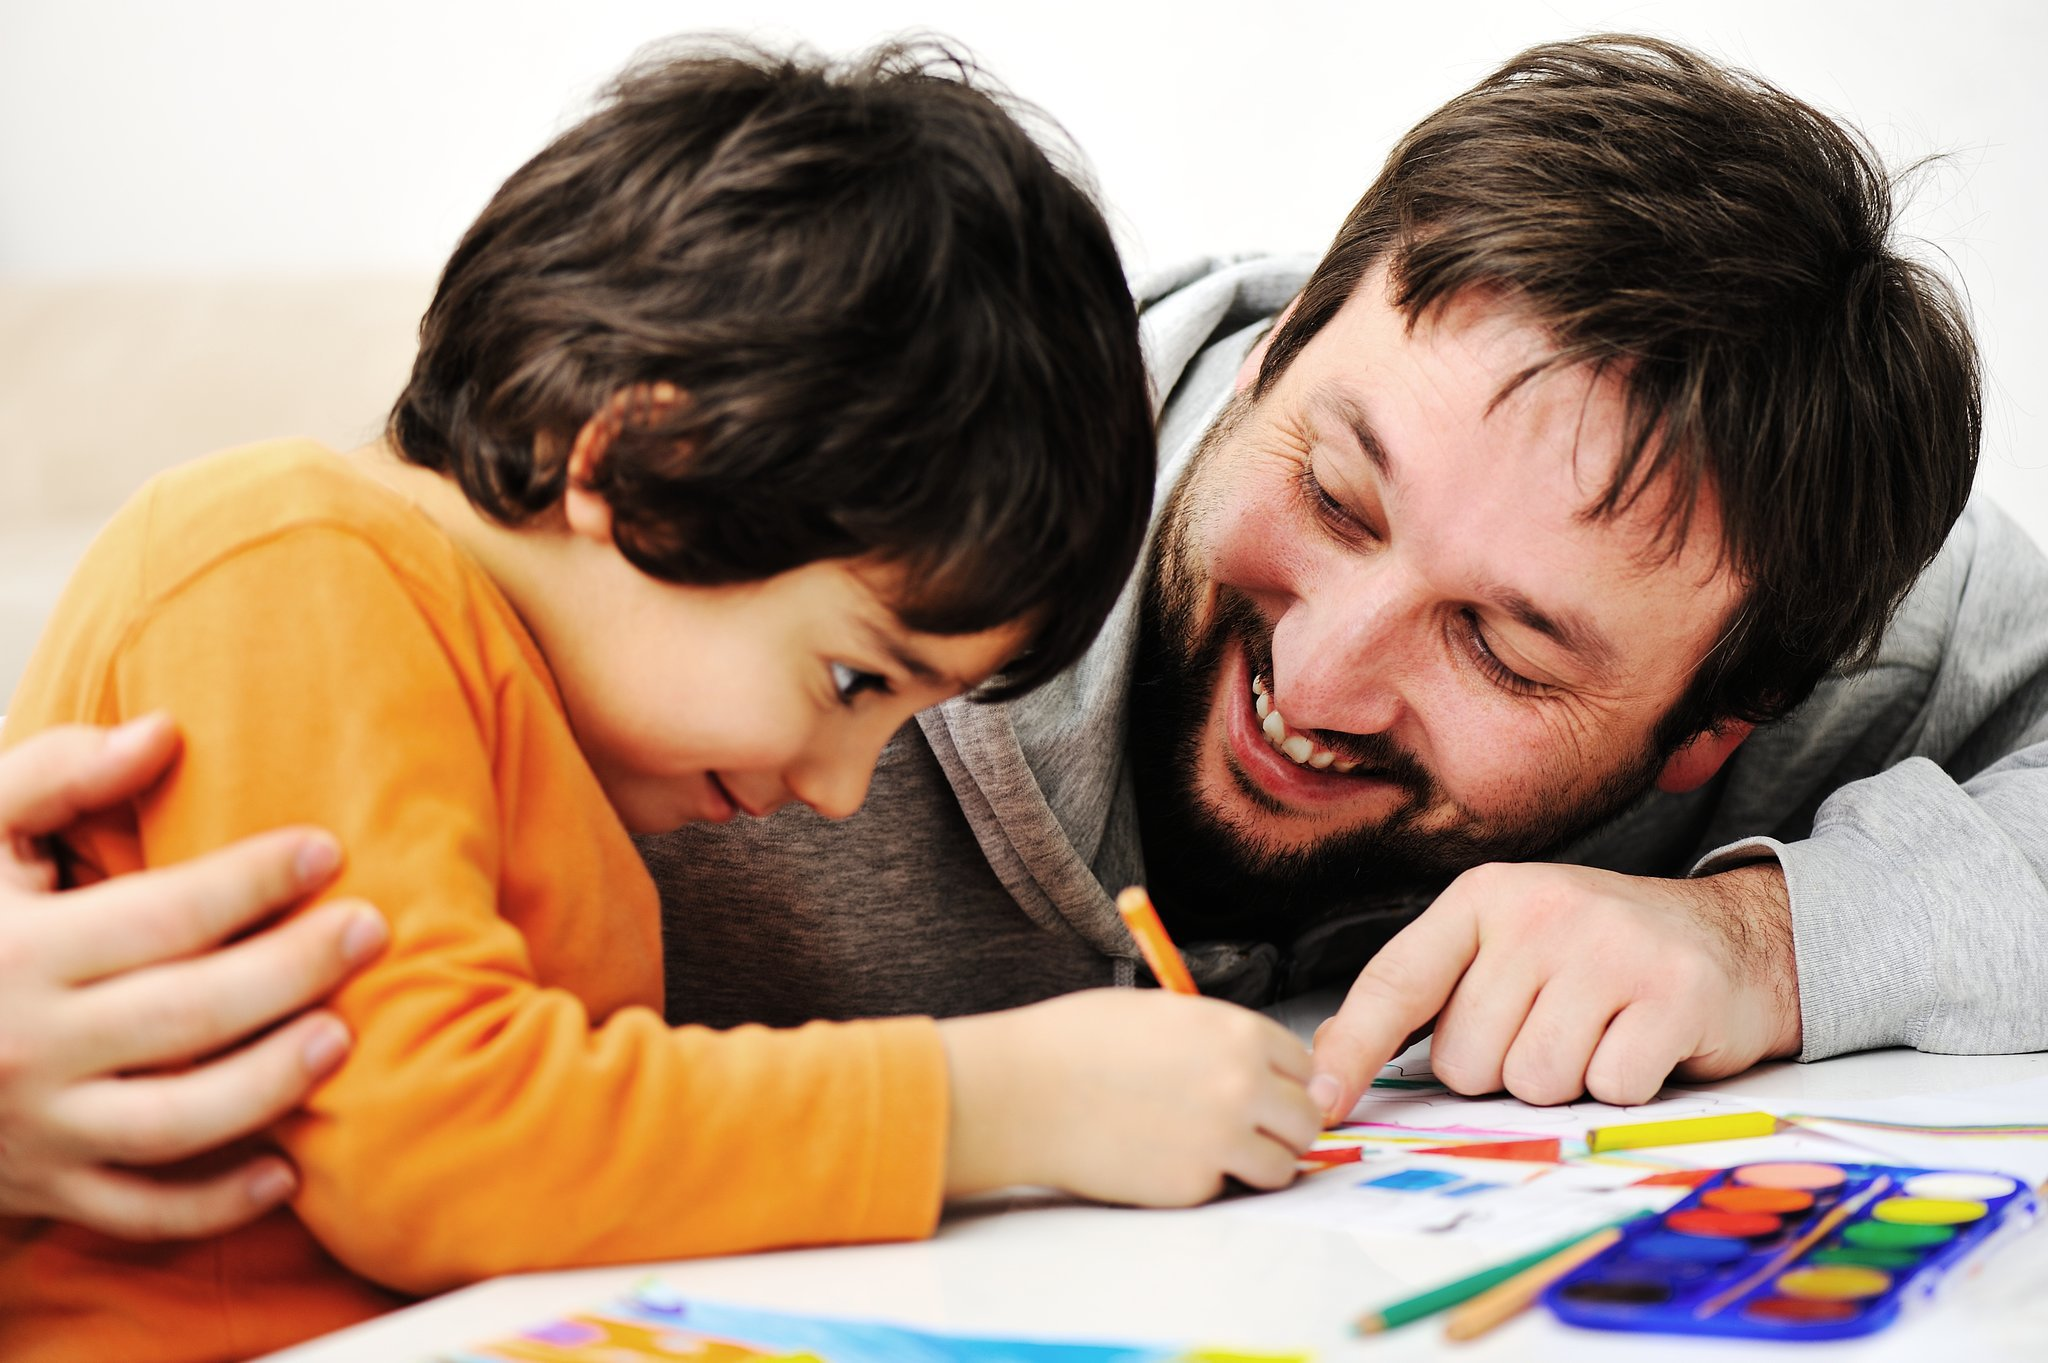 speech help for toddlers - Wunderlist